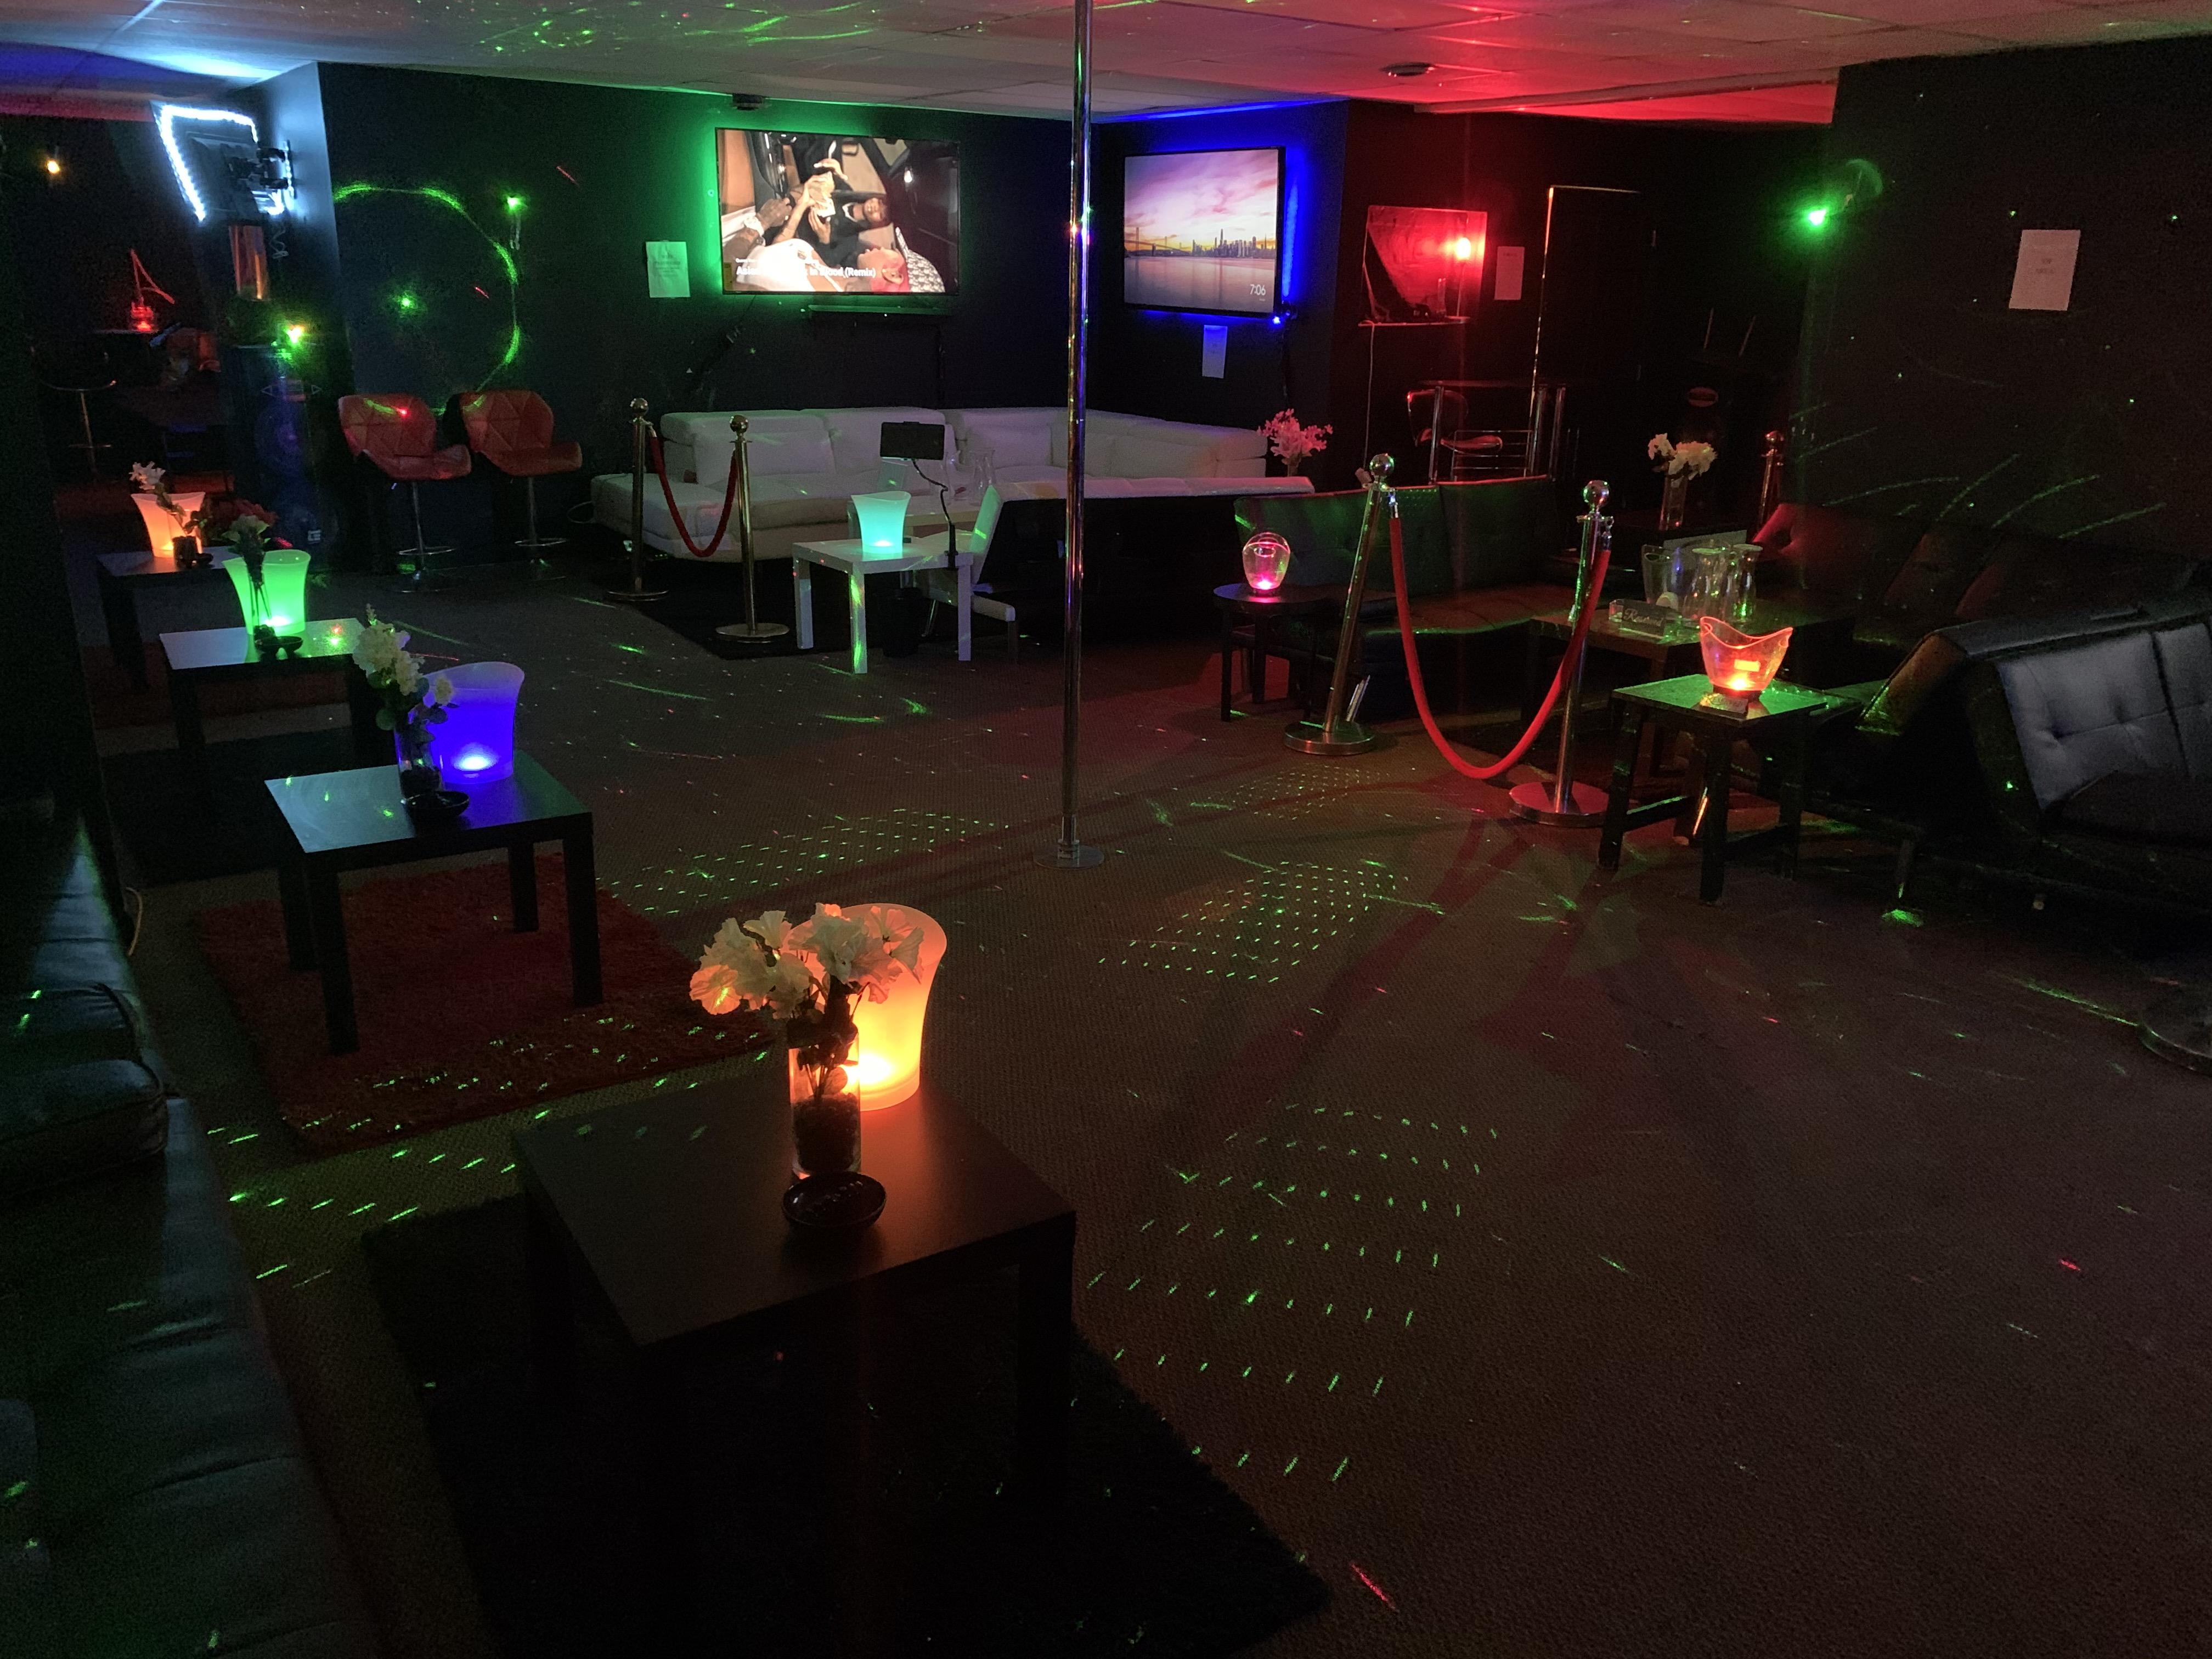 Exstacy Lounge Venue (Overnight stay)